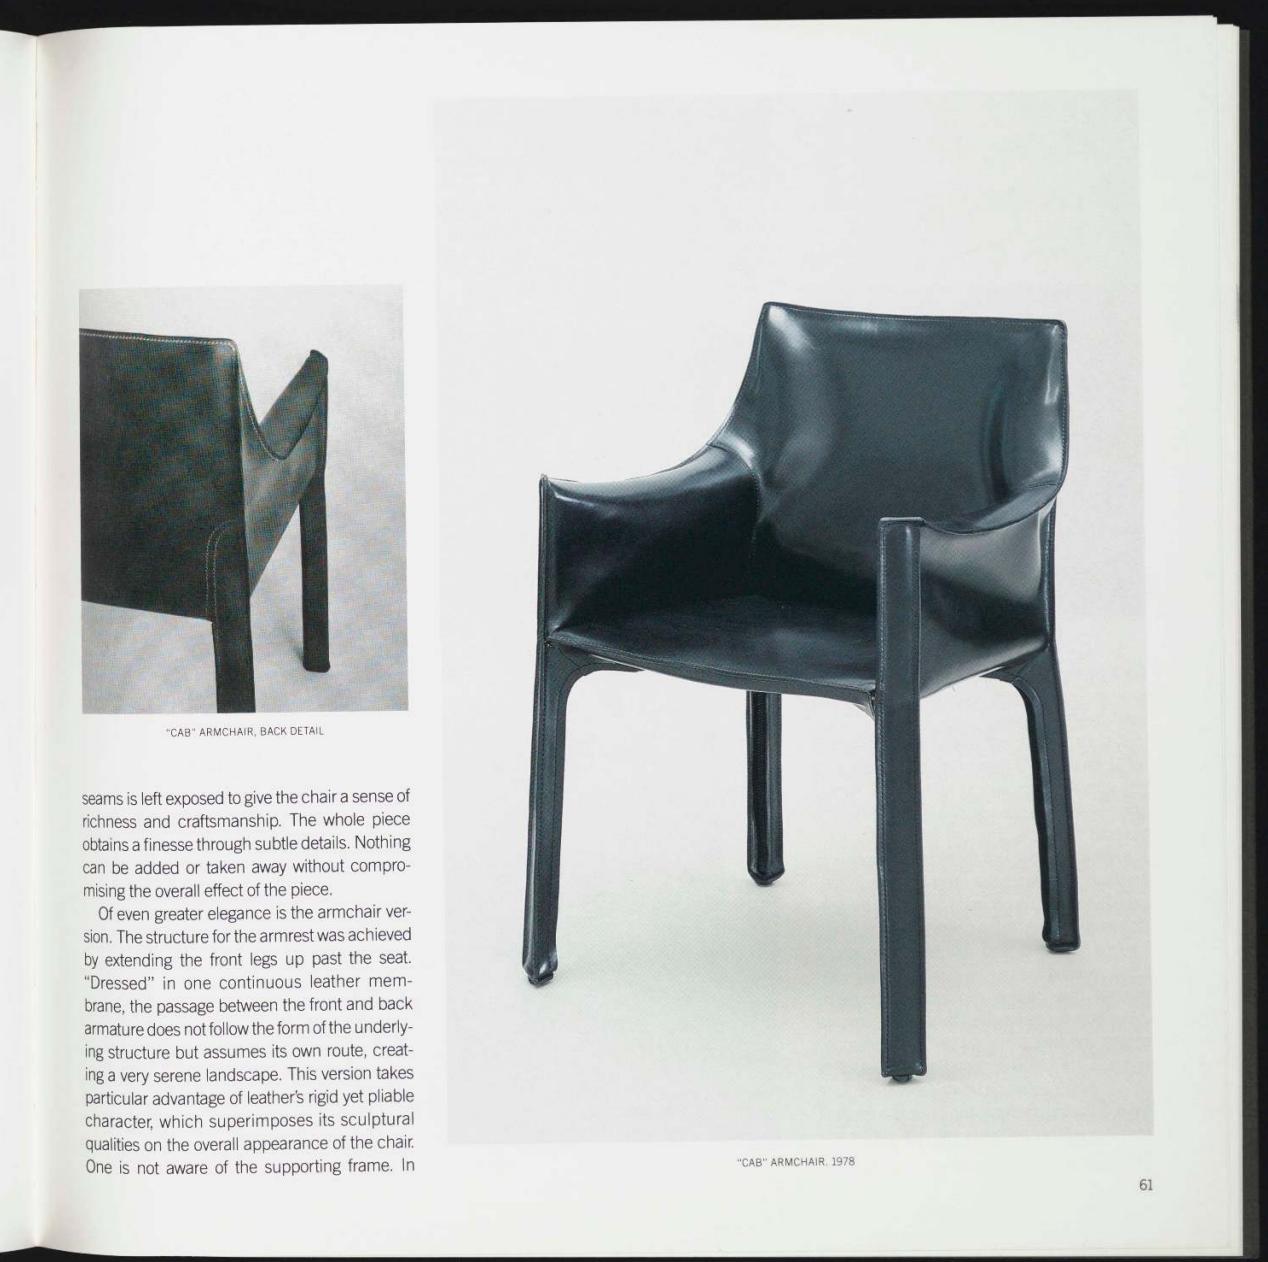 — The Museum of Modern Art, 1987